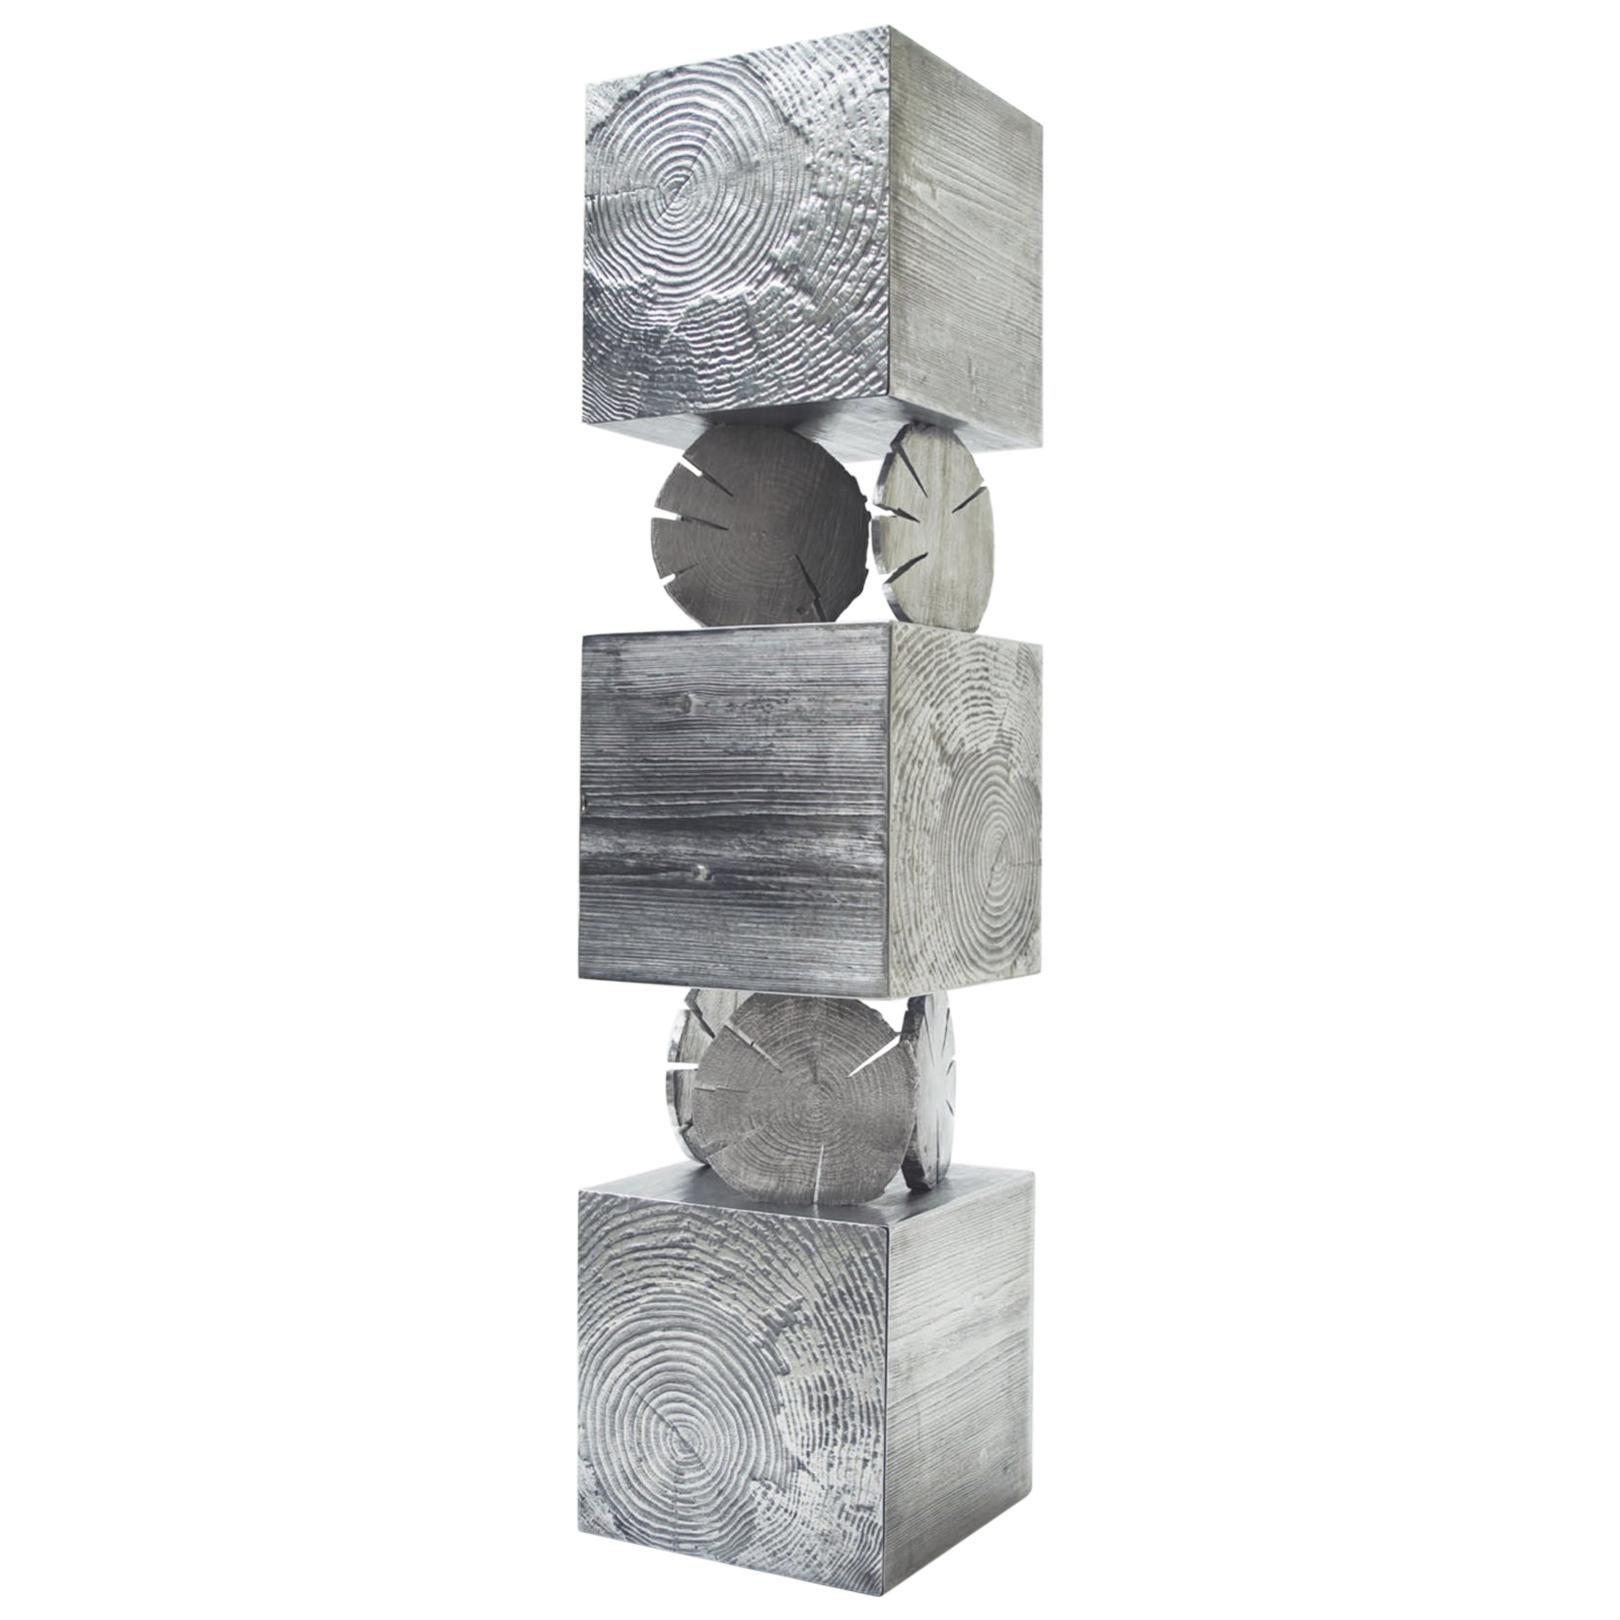 Modern Andrea Salvetti for Dilmos Cabinet Sculpture Storage Aluminium Gold Cast